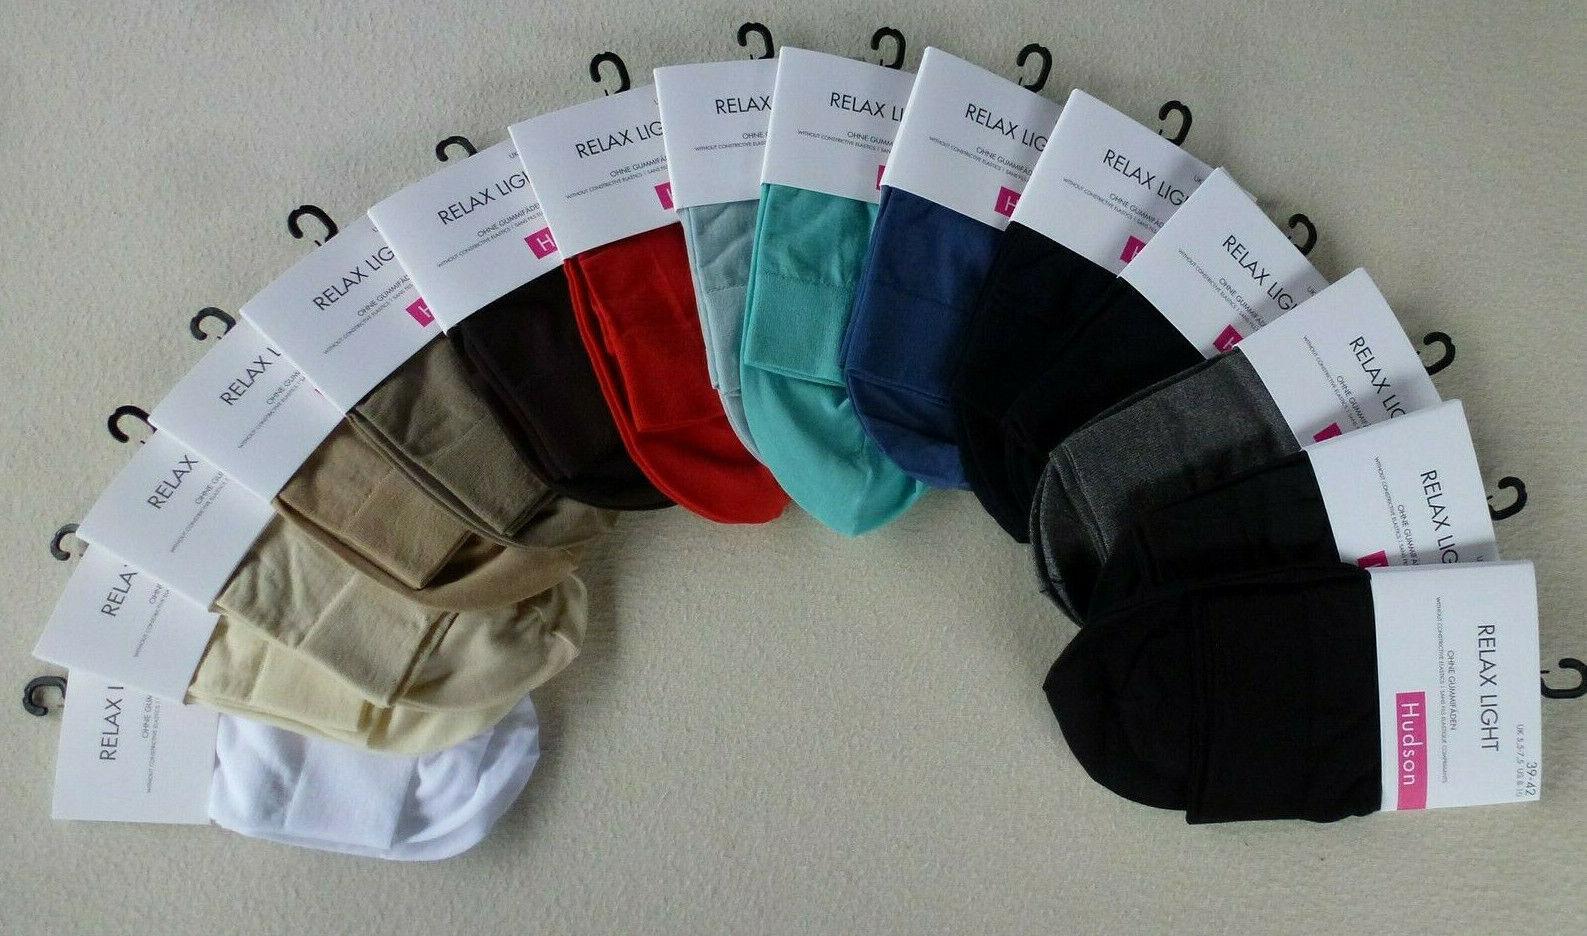 HUDSON Damen RELAX LIGHT Socken Komfortbund ohne Gummifäden 60% CO 35-38 39-42